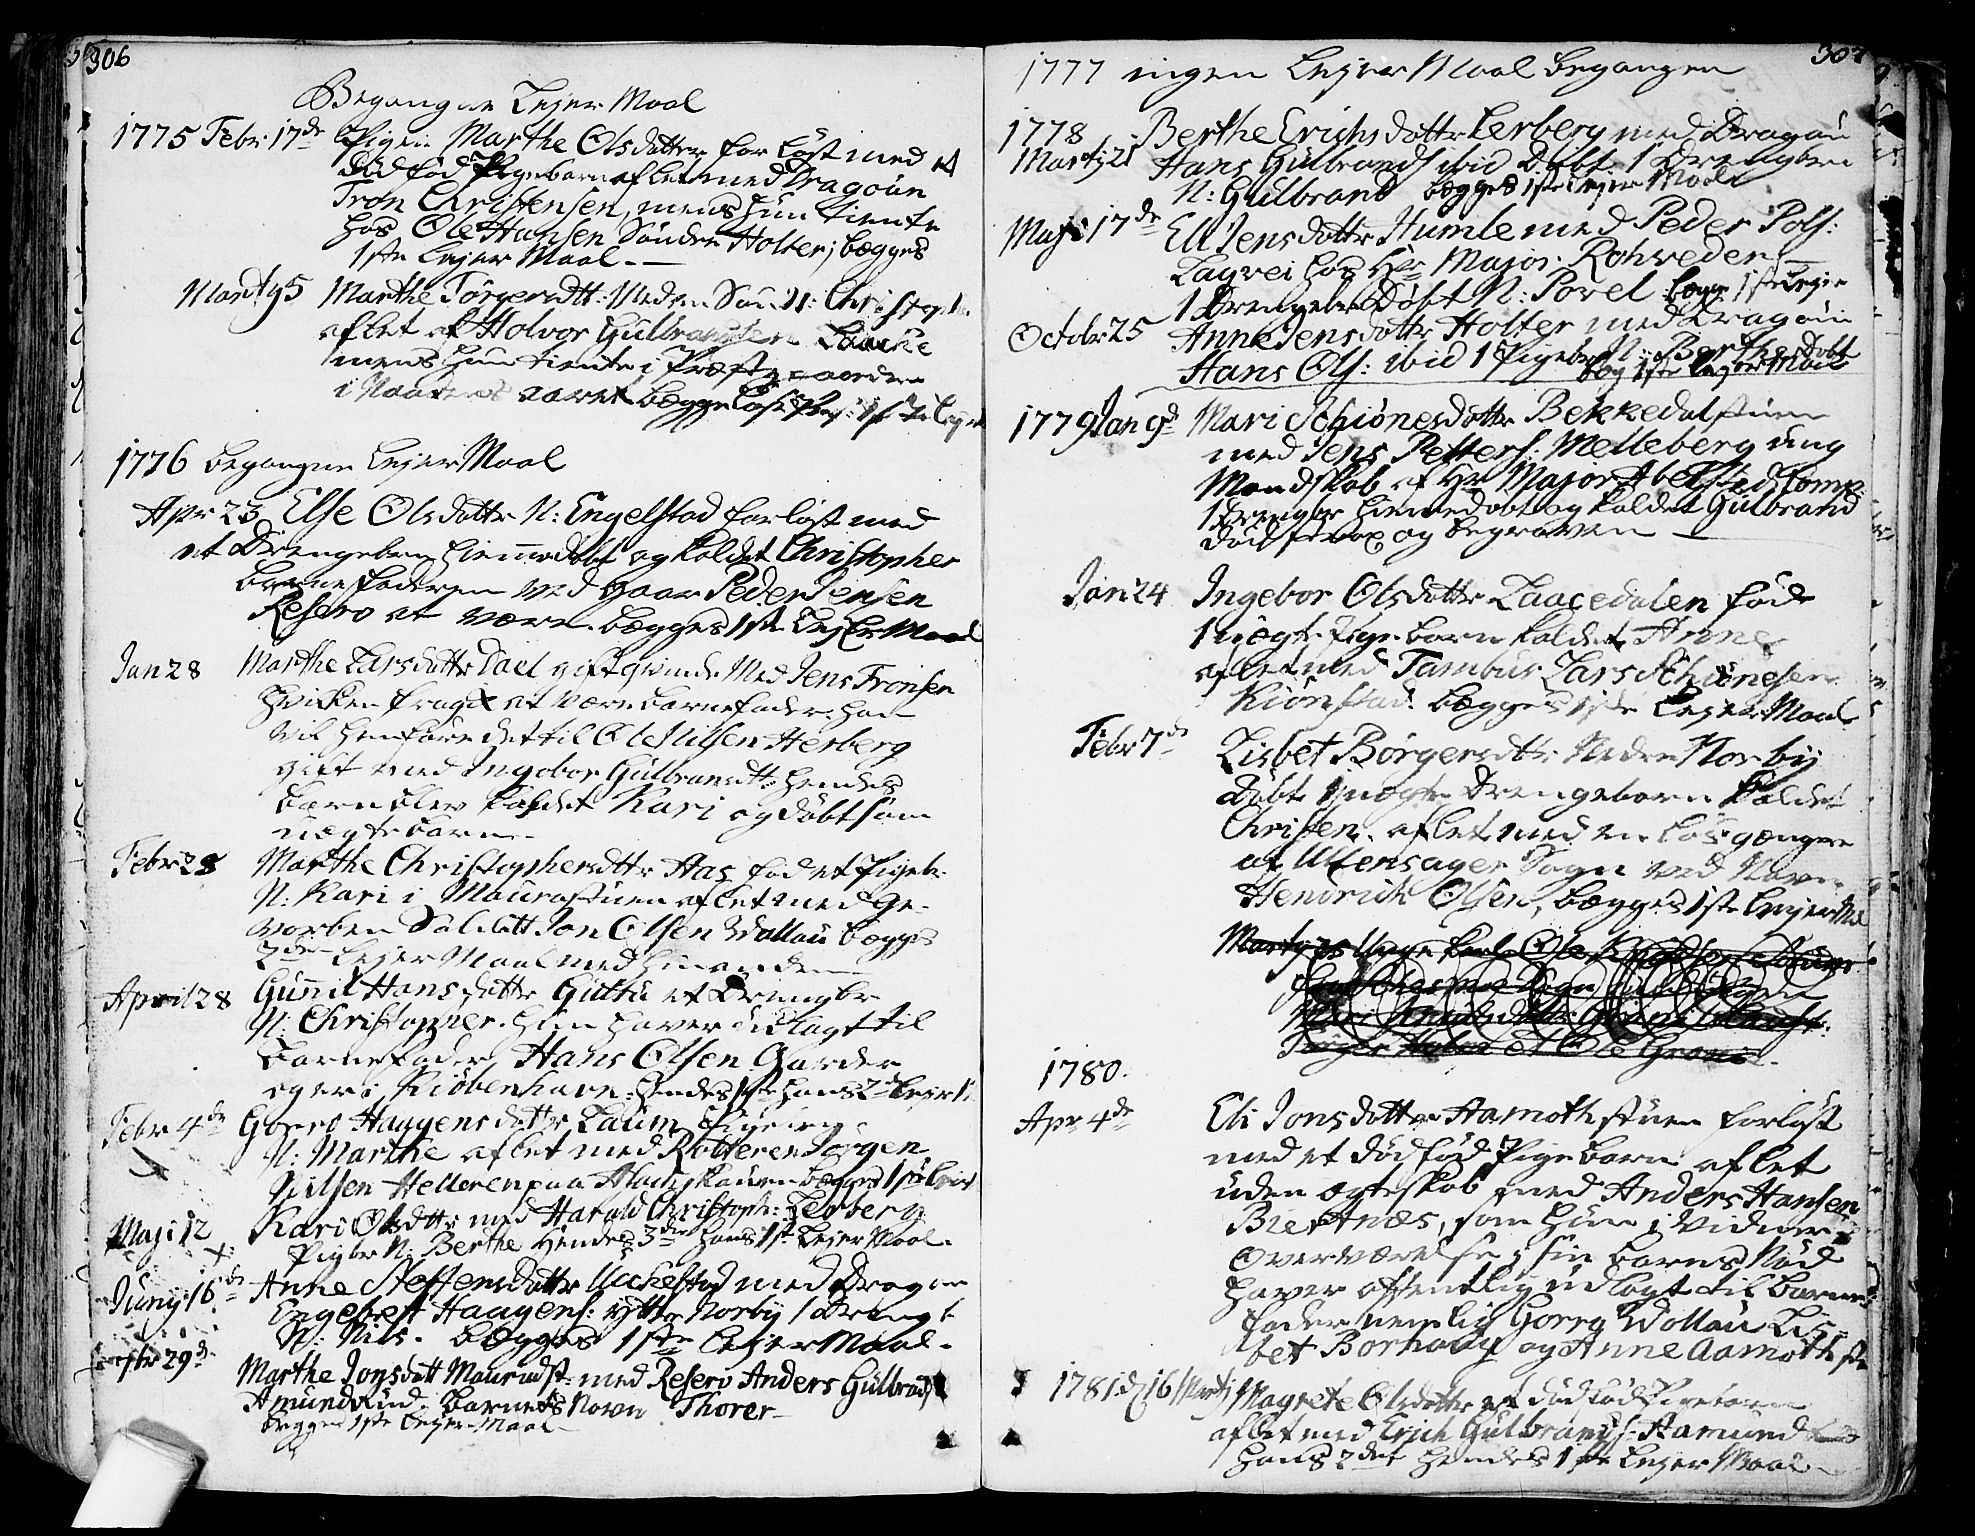 SAO, Nannestad prestekontor Kirkebøker, F/Fa/L0007: Ministerialbok nr. I 7, 1754-1791, s. 306-307